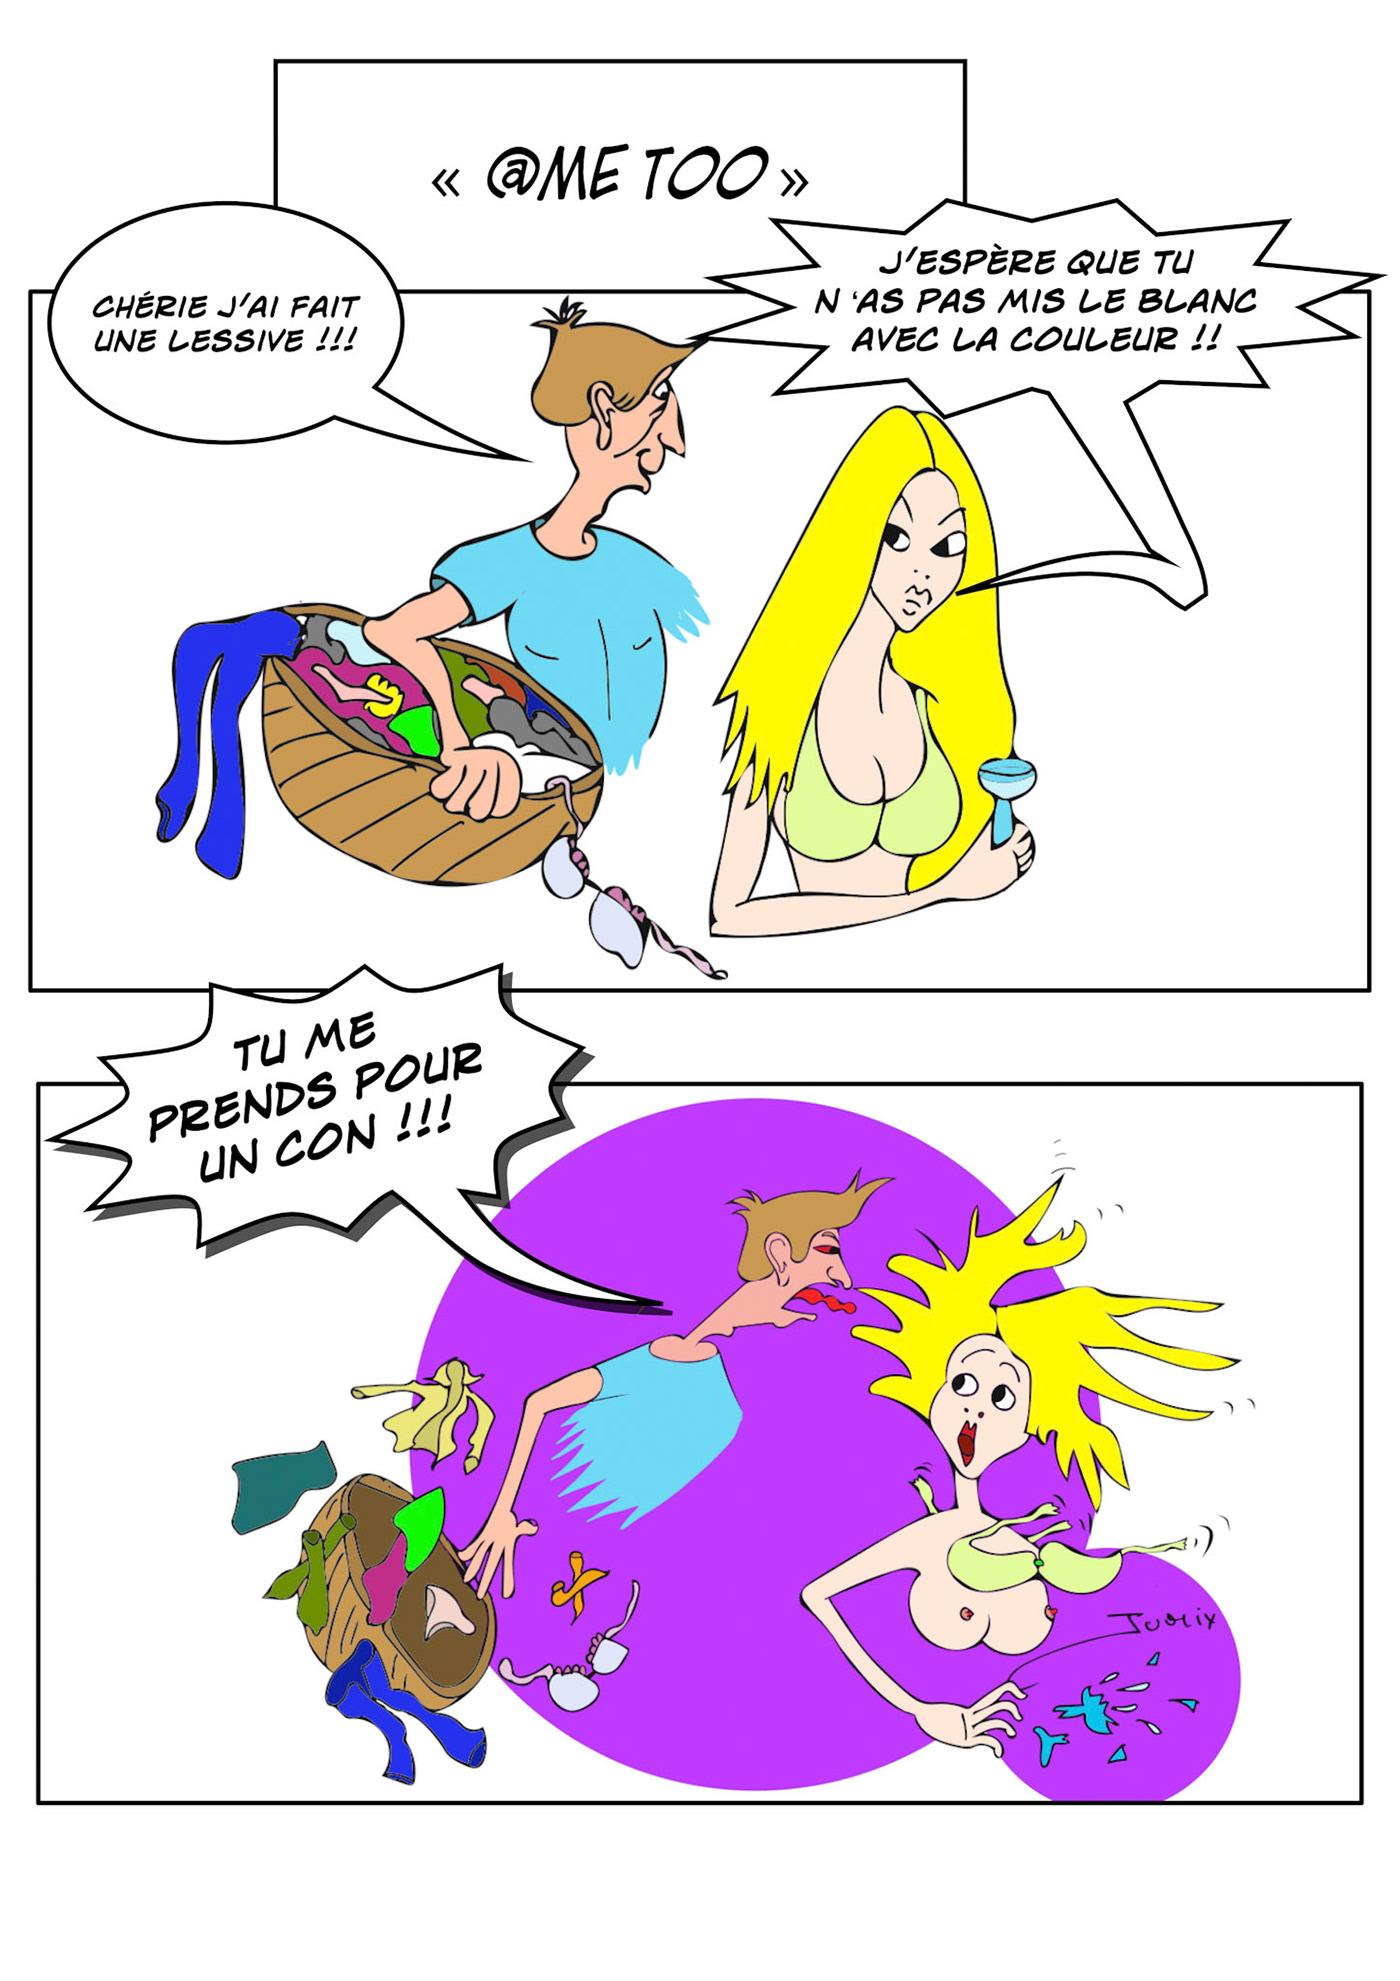 Image may contain: cartoon, drawing and comic